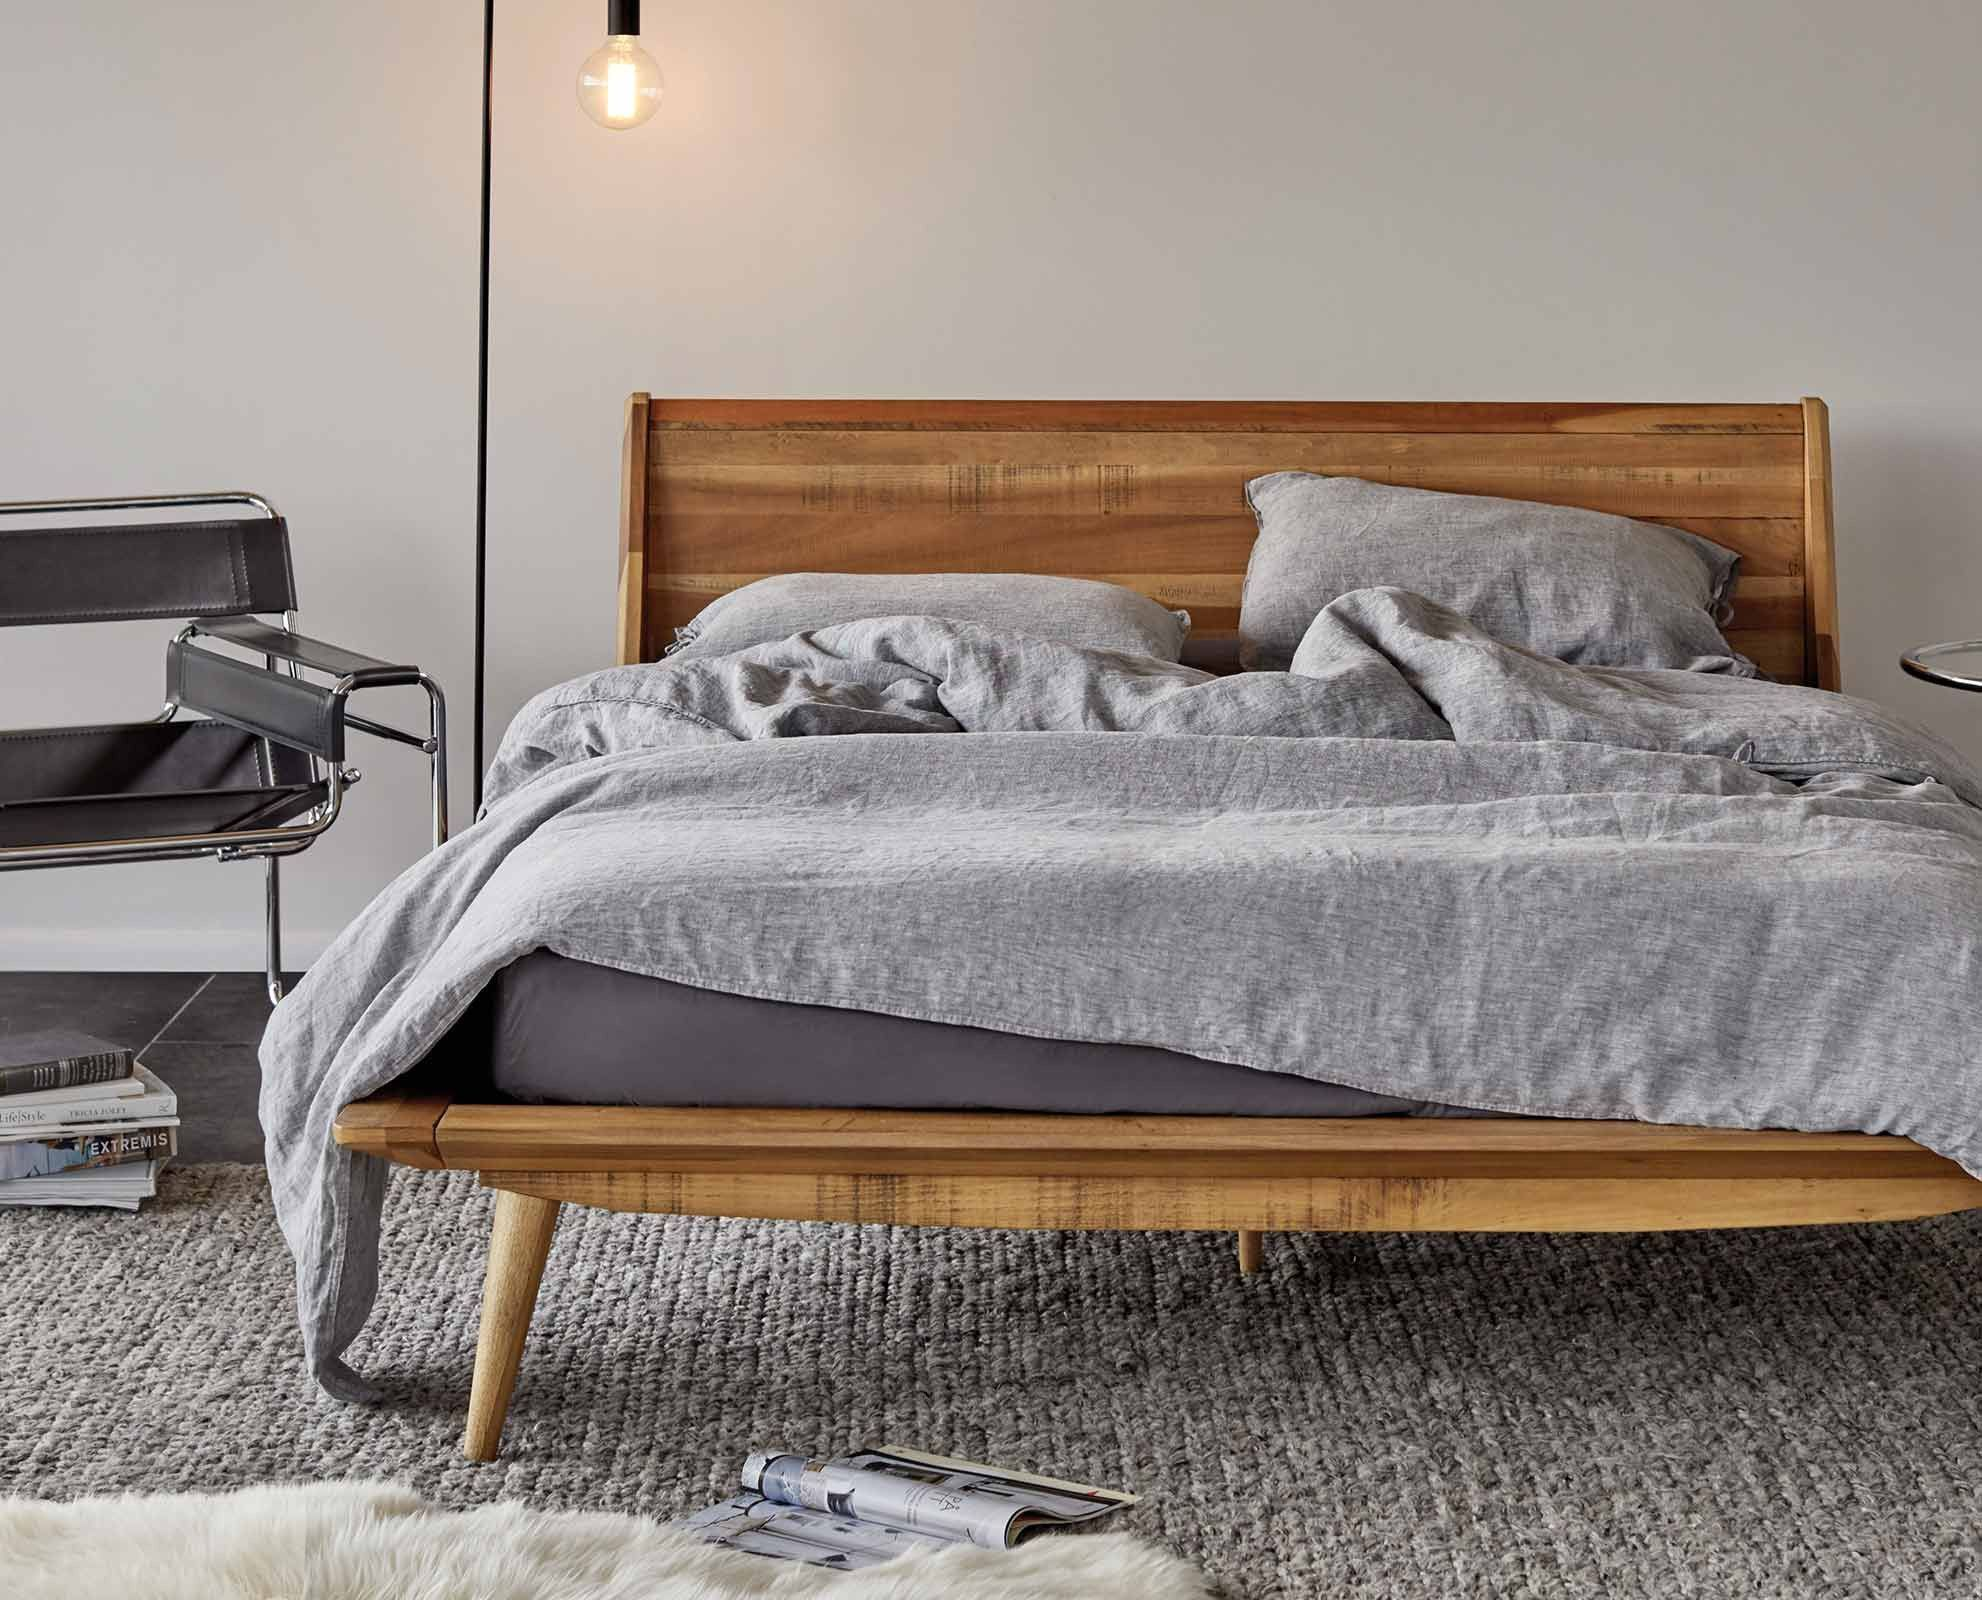 Contemporary Scandinavian Design Bedroom Contemporarymodernhouse Scandinaviankitchen